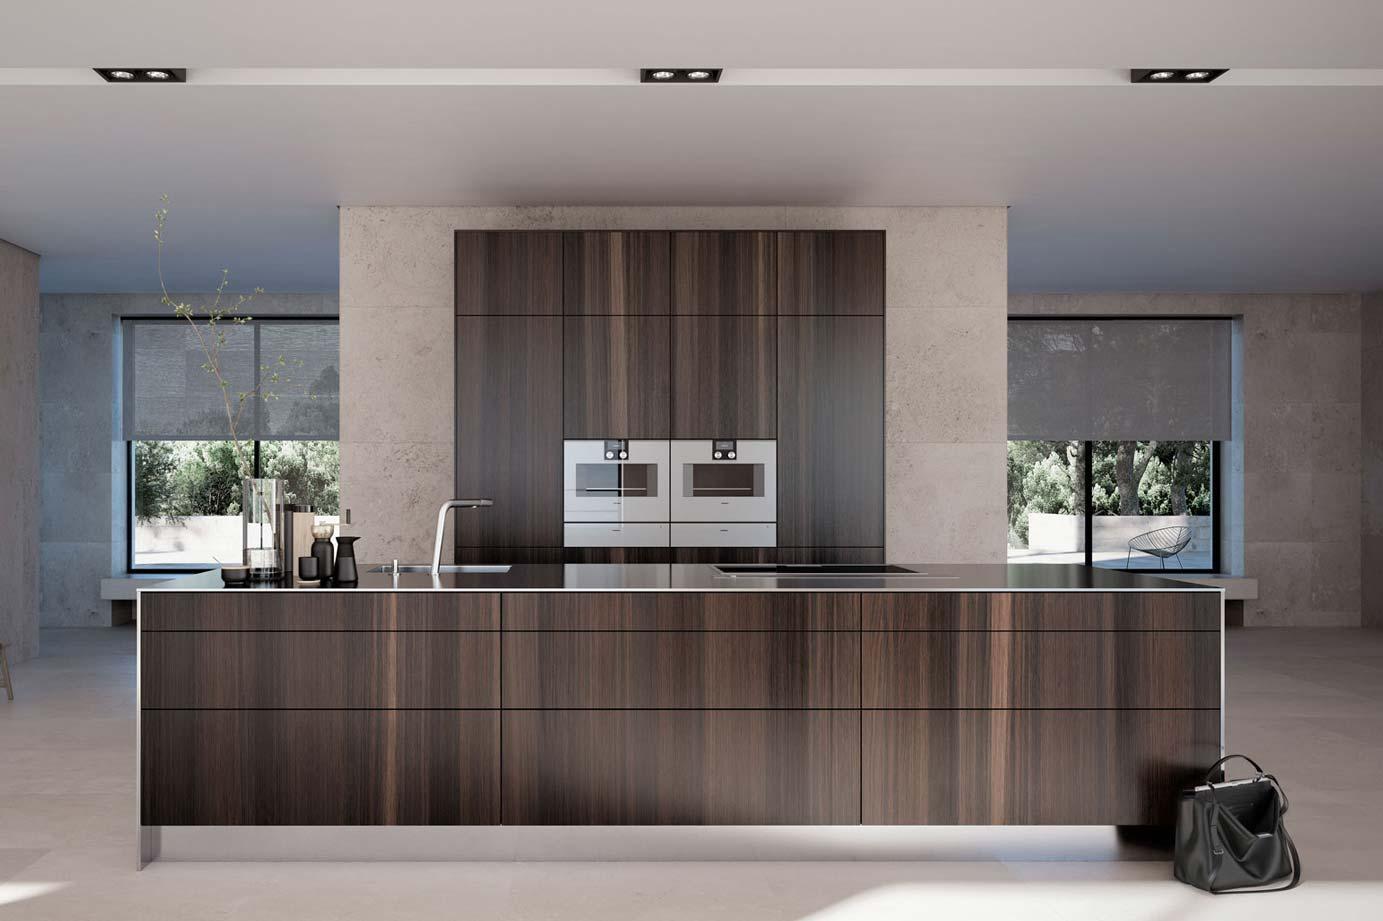 Siematic keukens pure bij de betrouwbaarste keukenspecialist keur